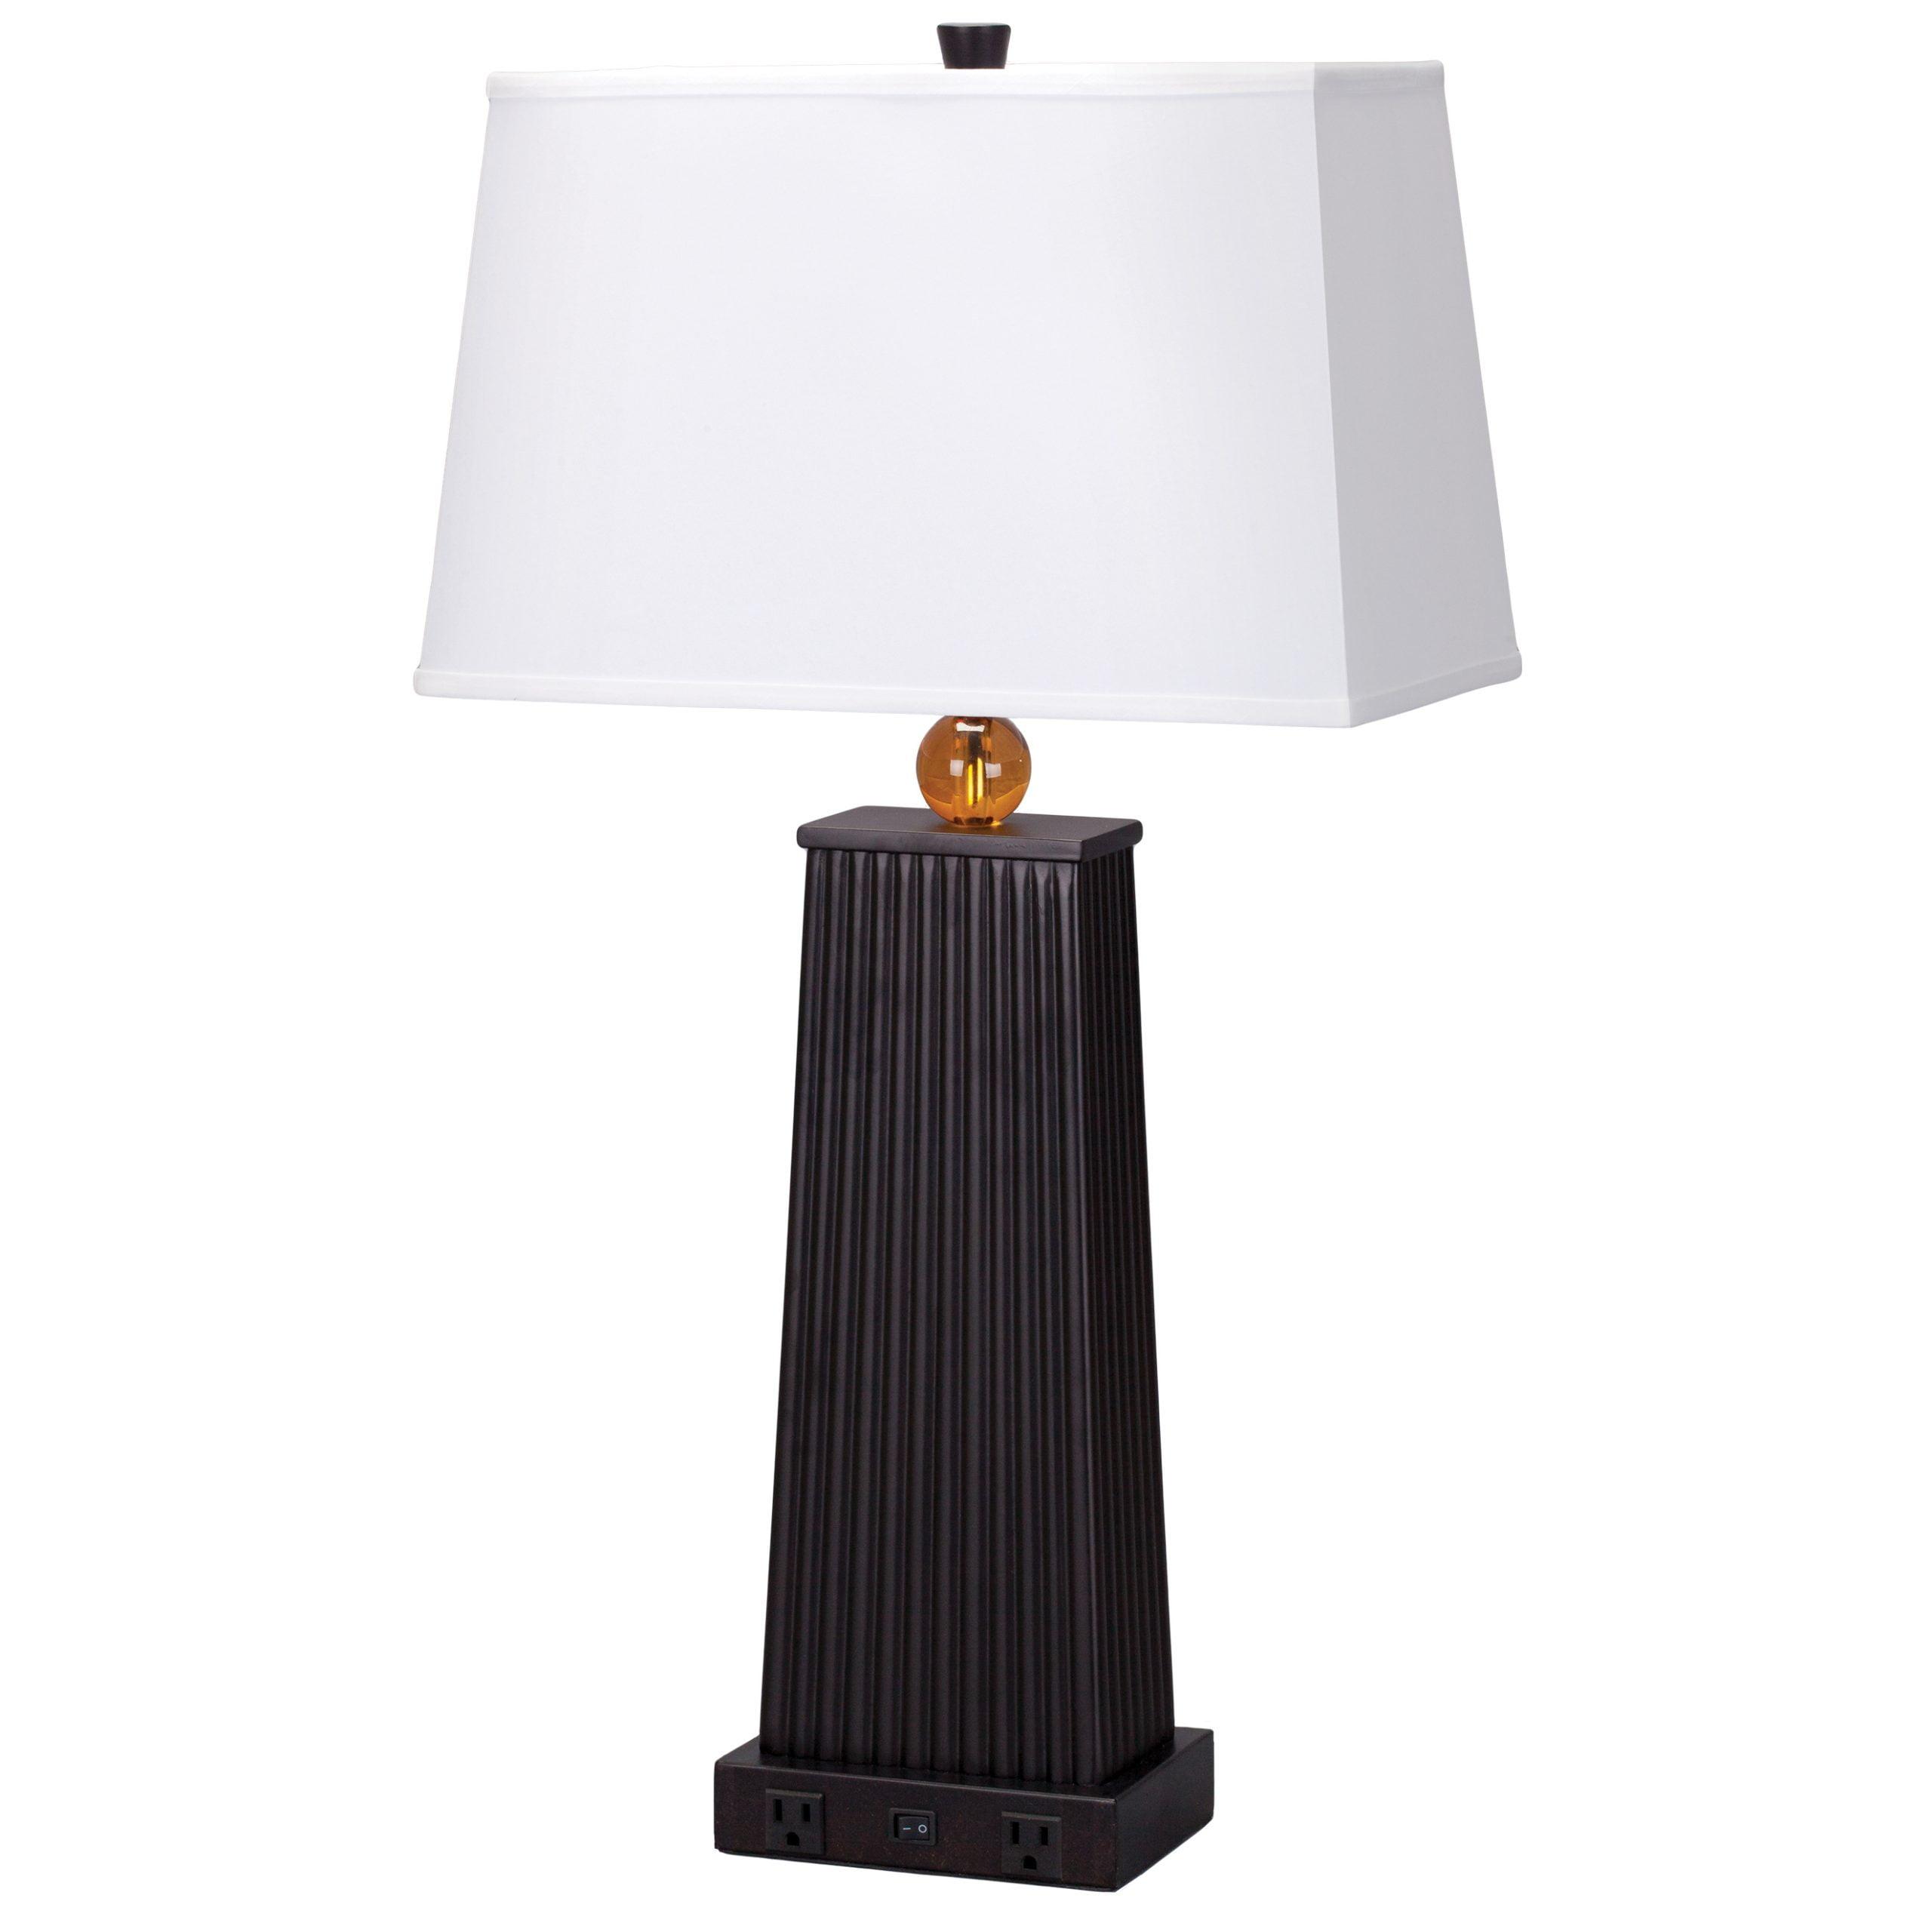 Spice Desk Lamp